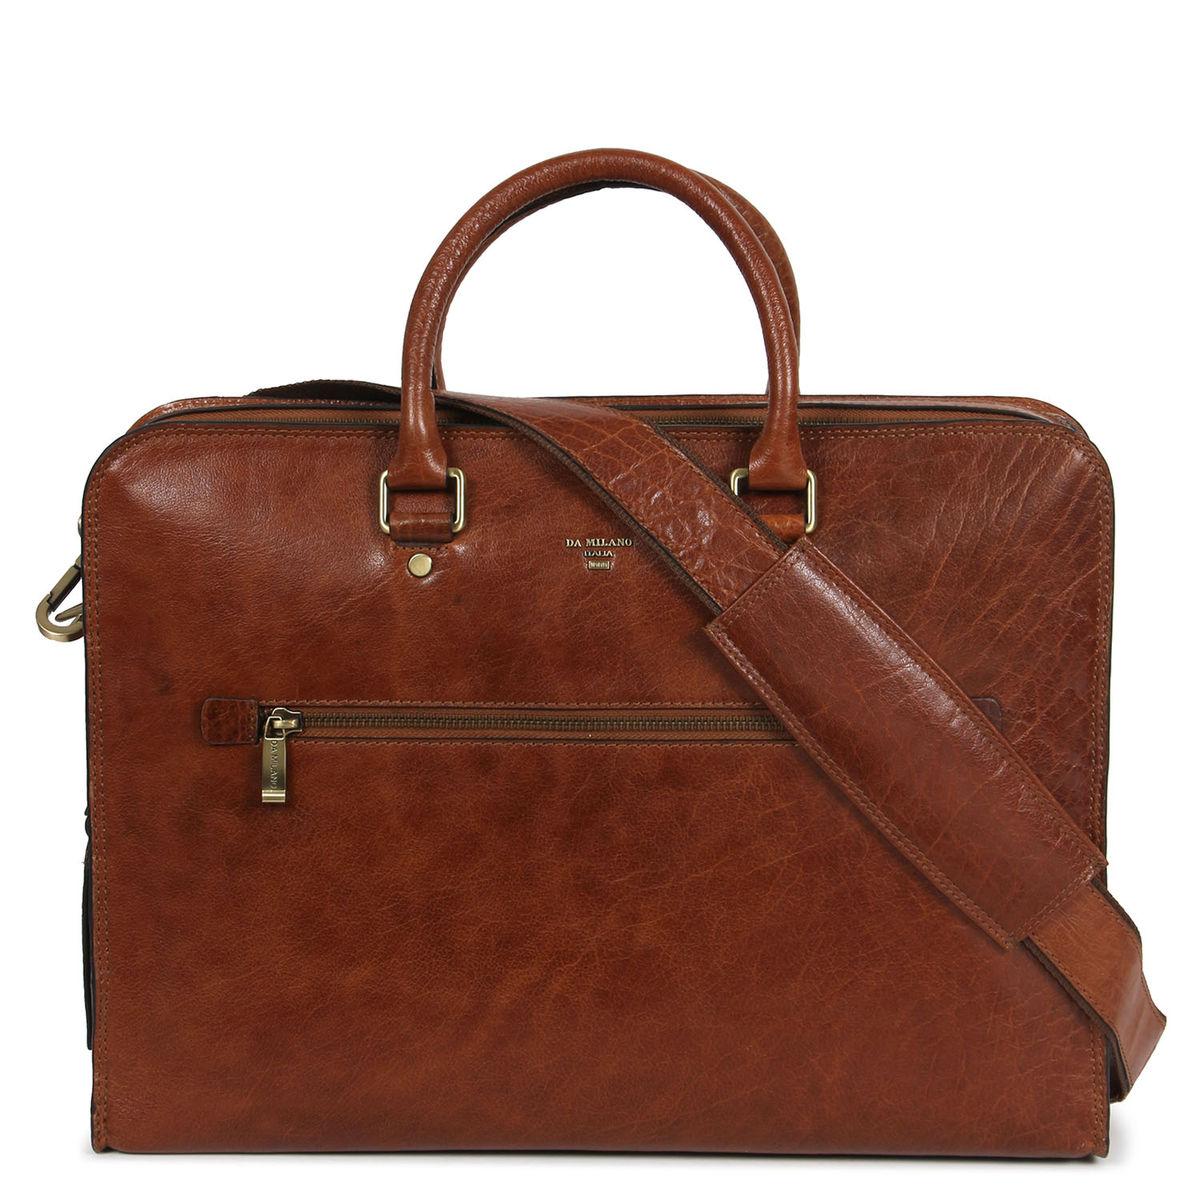 Image result for laptop bag by da milano